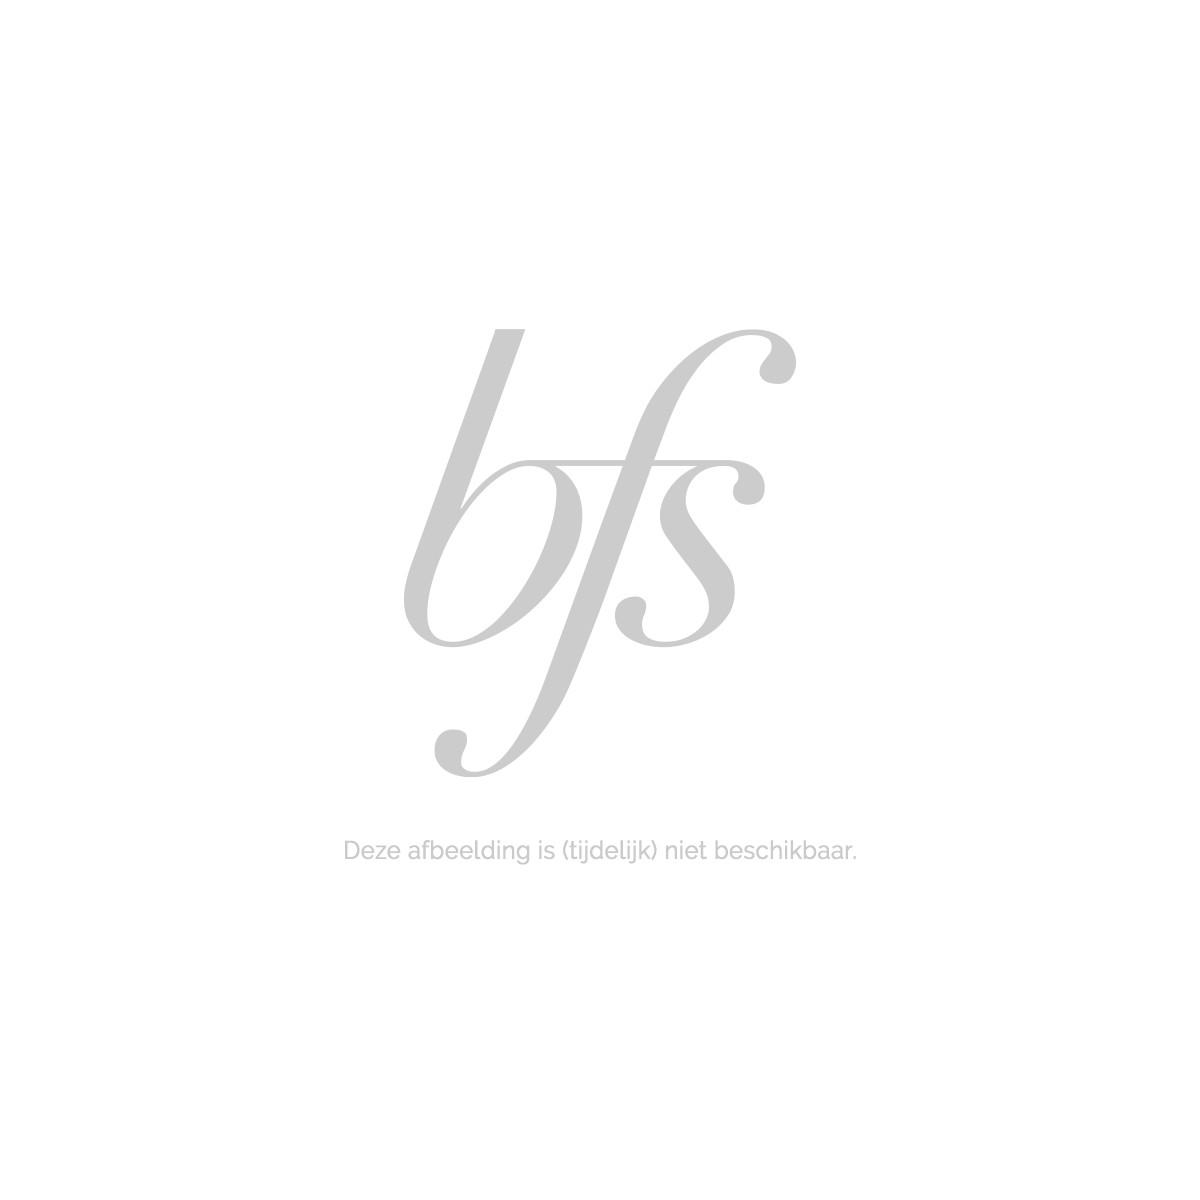 Christian Dior Mascara Diorshow New Look Vol. and Care Mascara 10 Ml